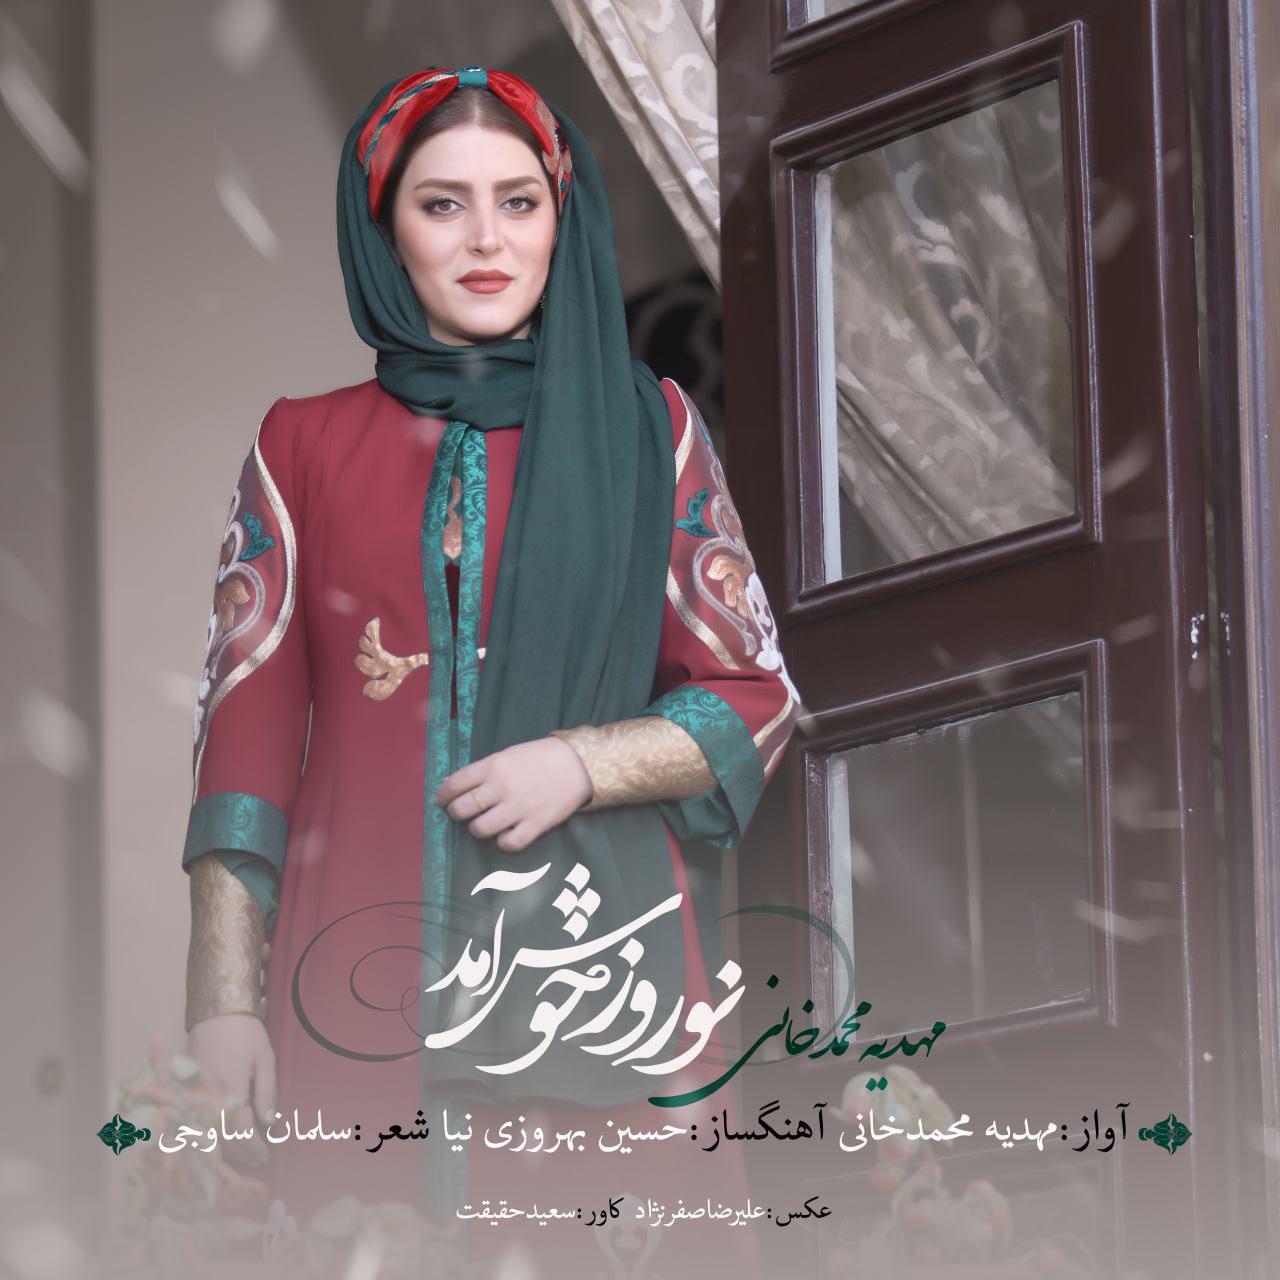 Mahdieh Mohammadkhani – Nowruz Khosh Amad